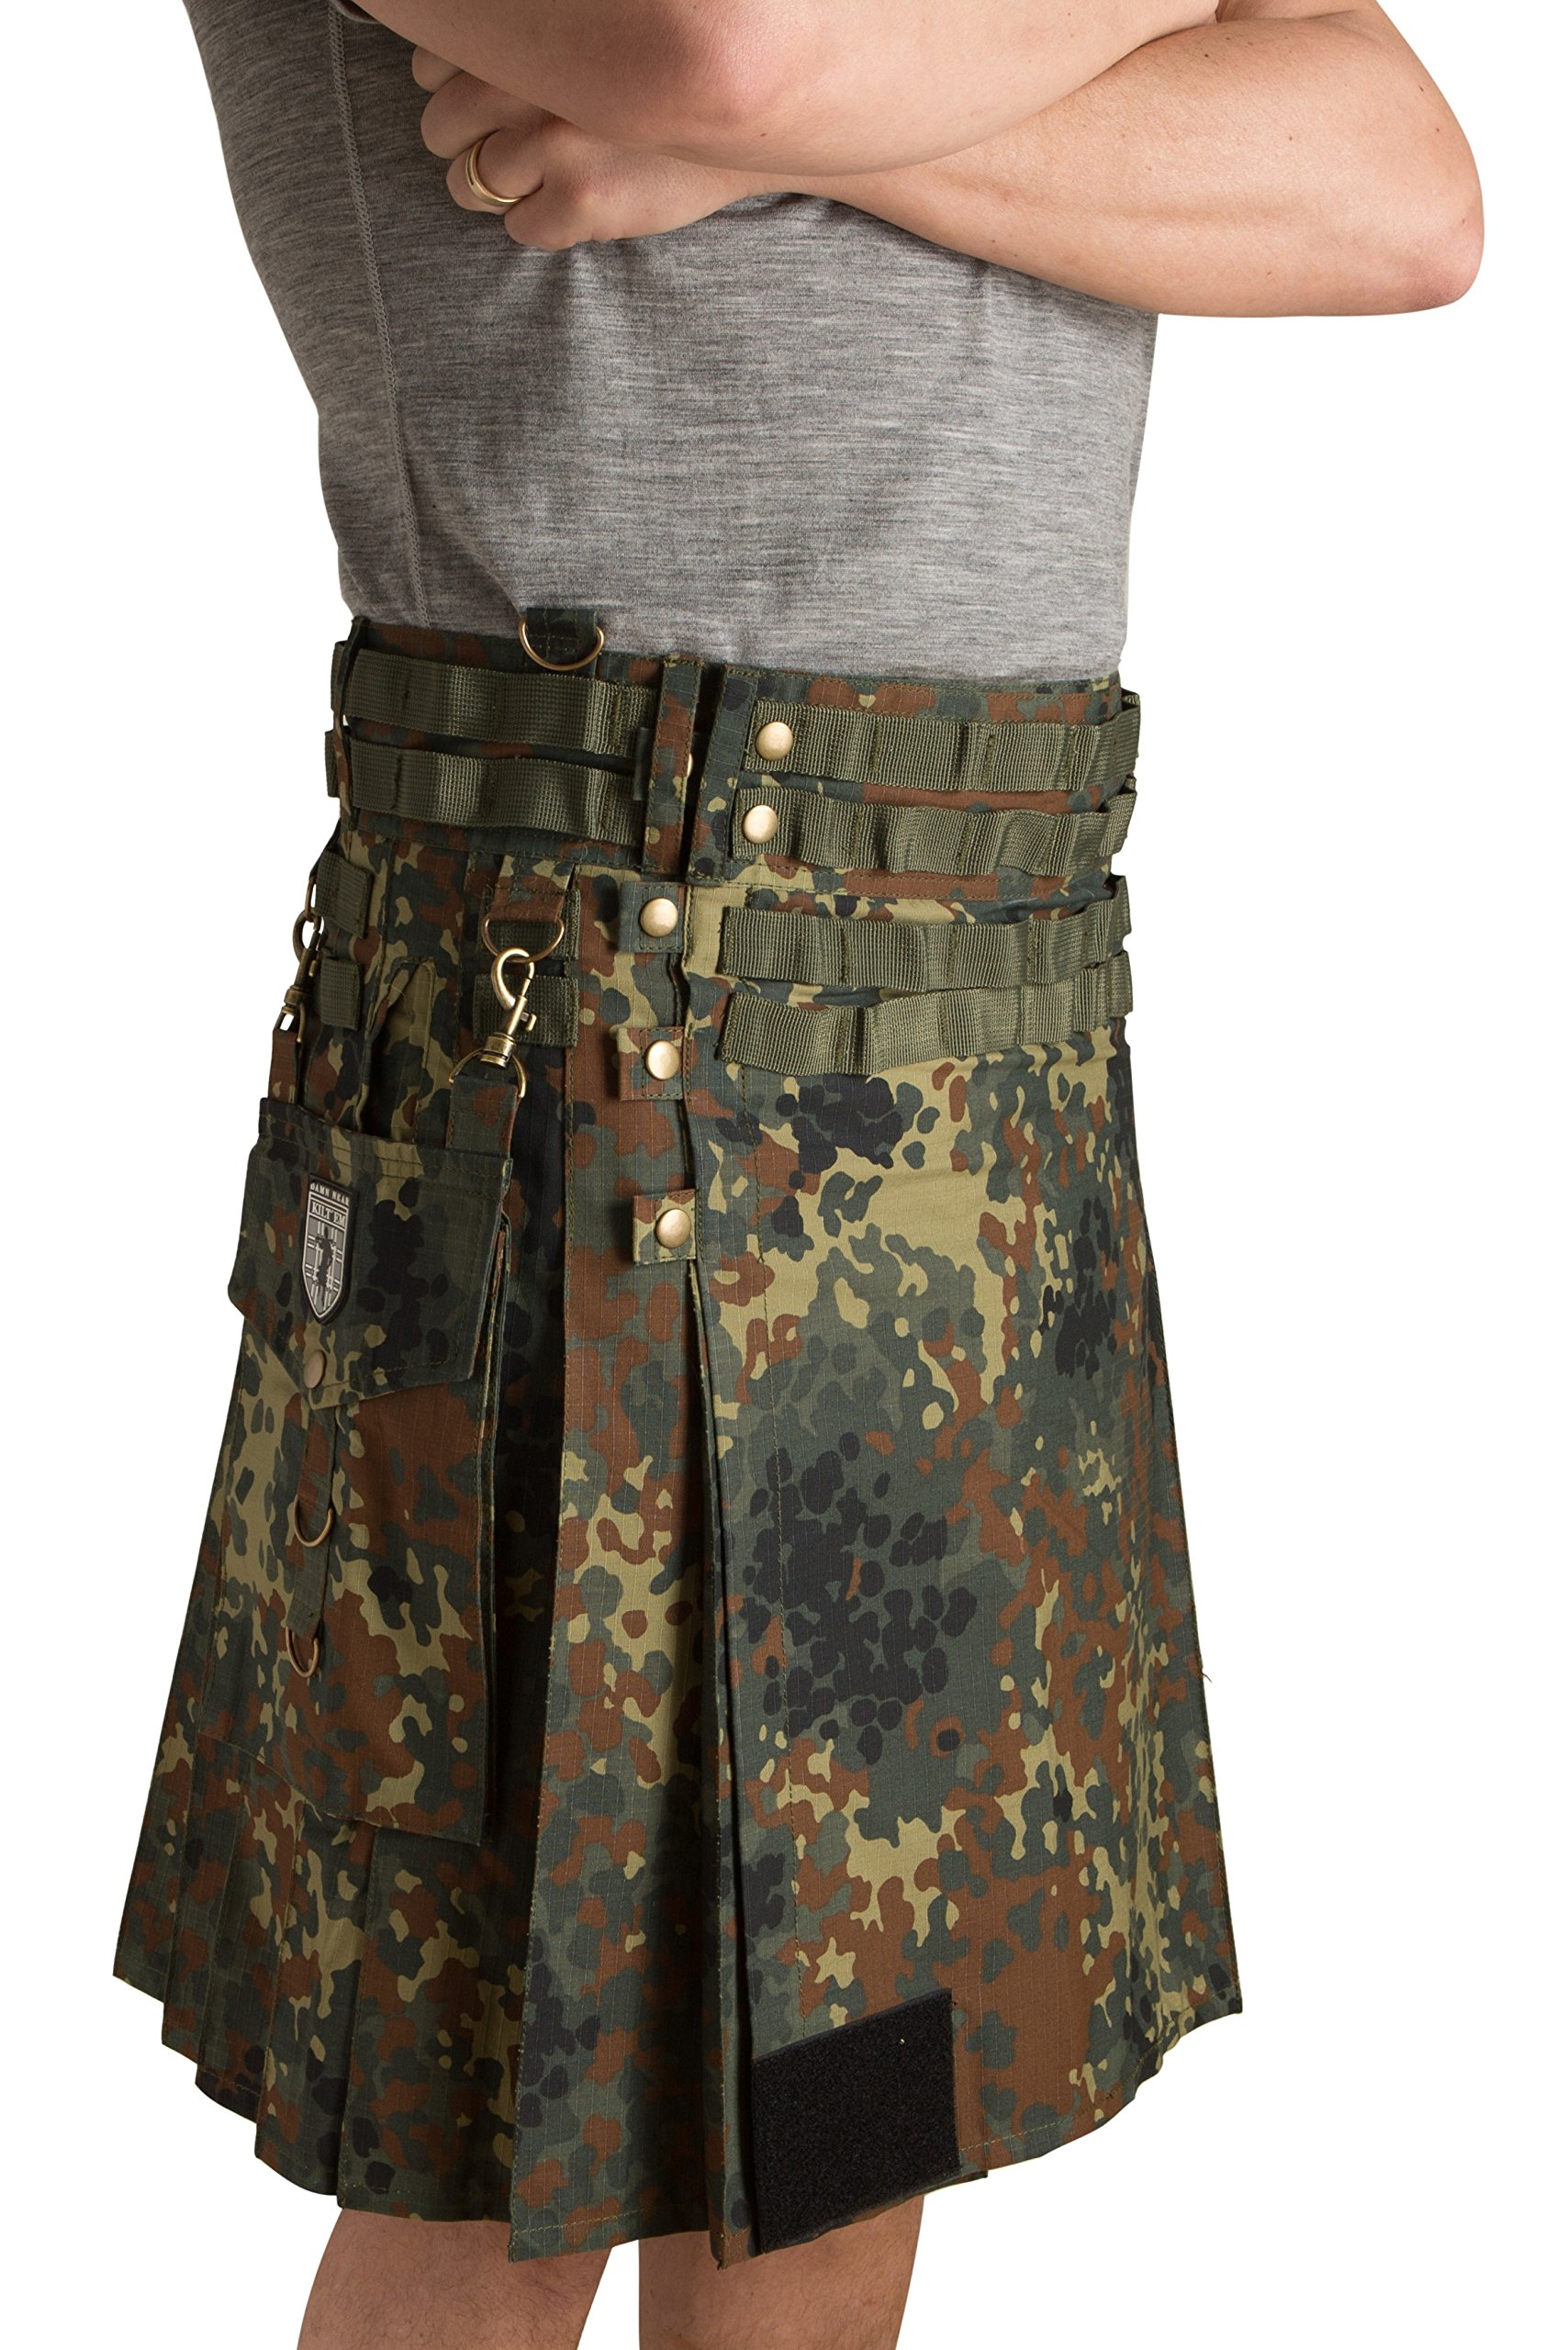 Damn Near Kilt 'Em Men's Tactical Kilt Large Flecktarn